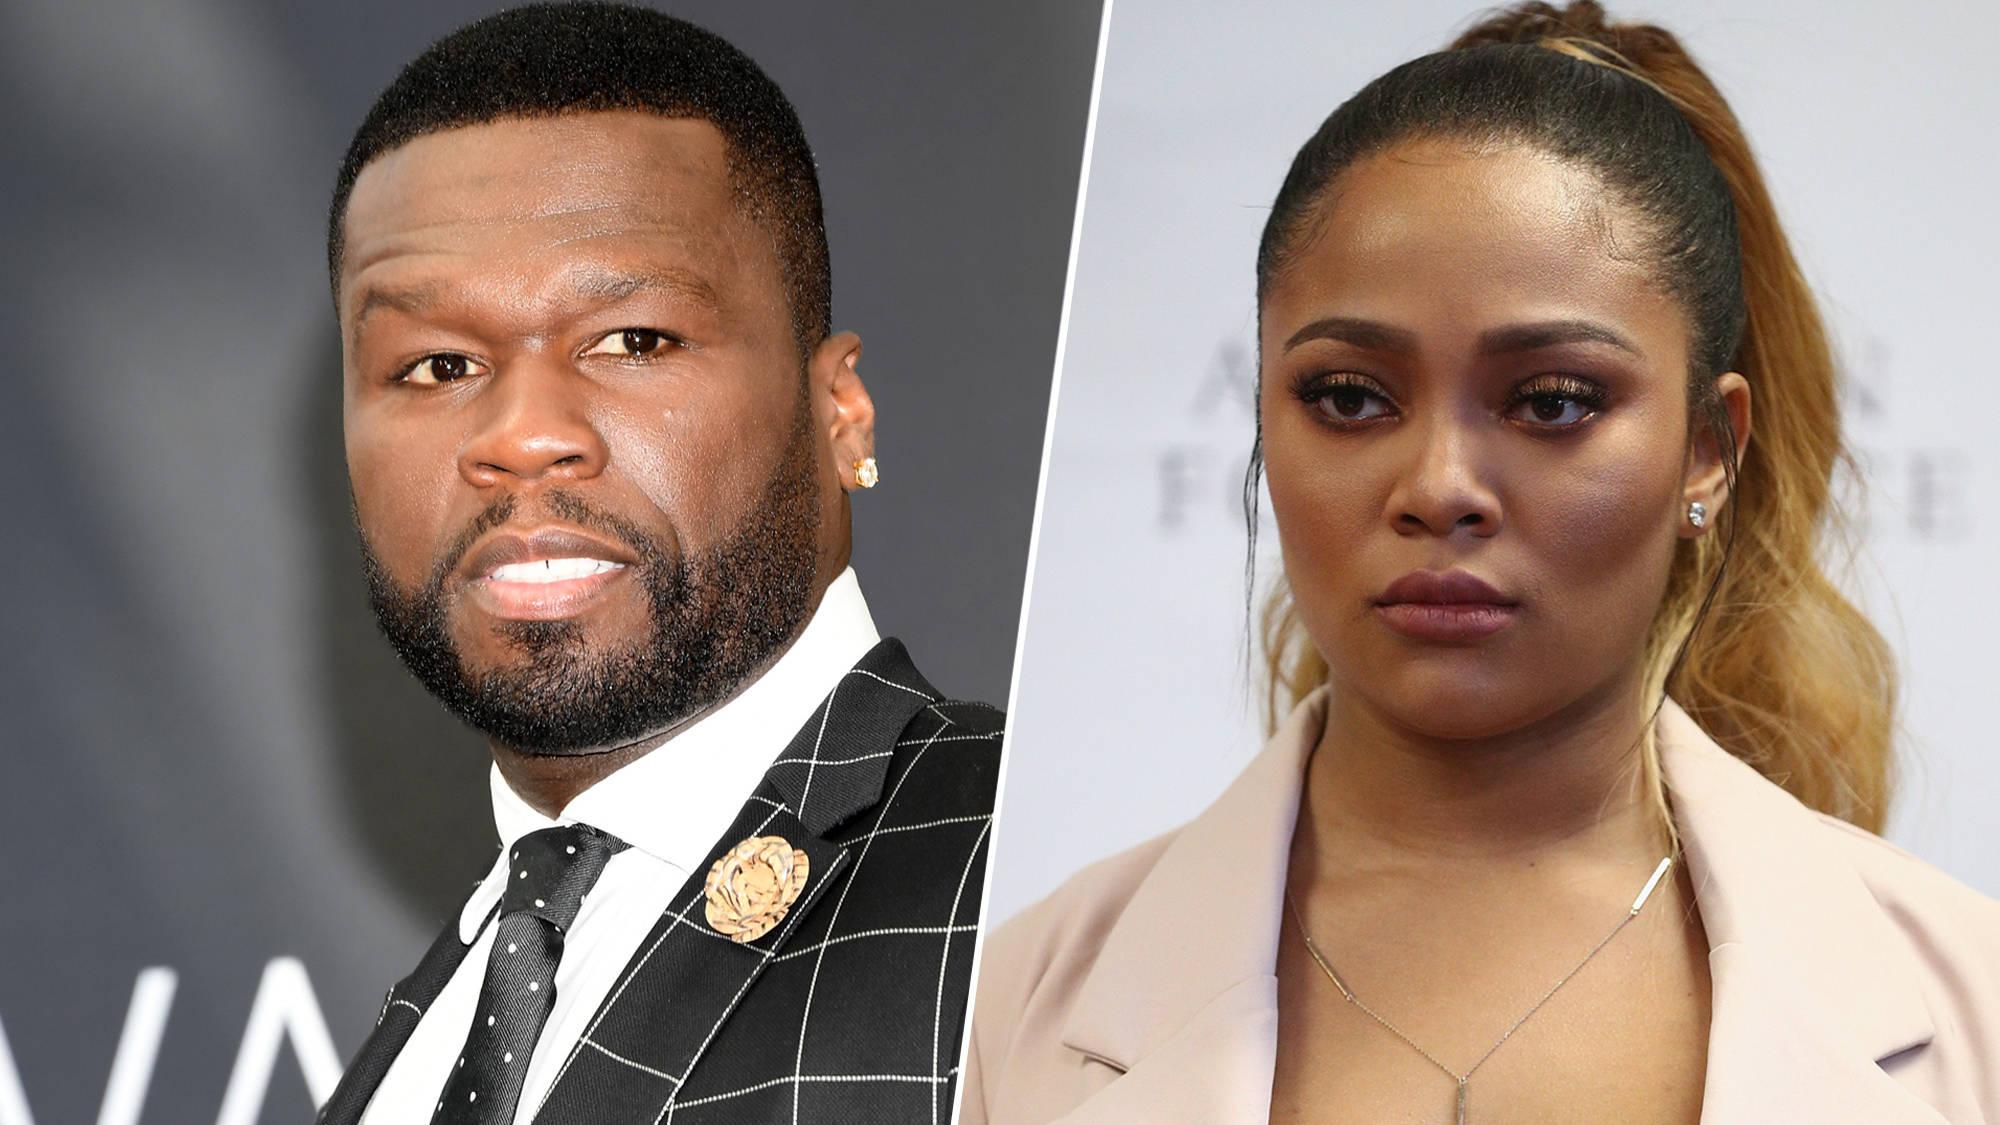 50 Cent Video Porno 50 cent avoids restraining order against teairra mari in